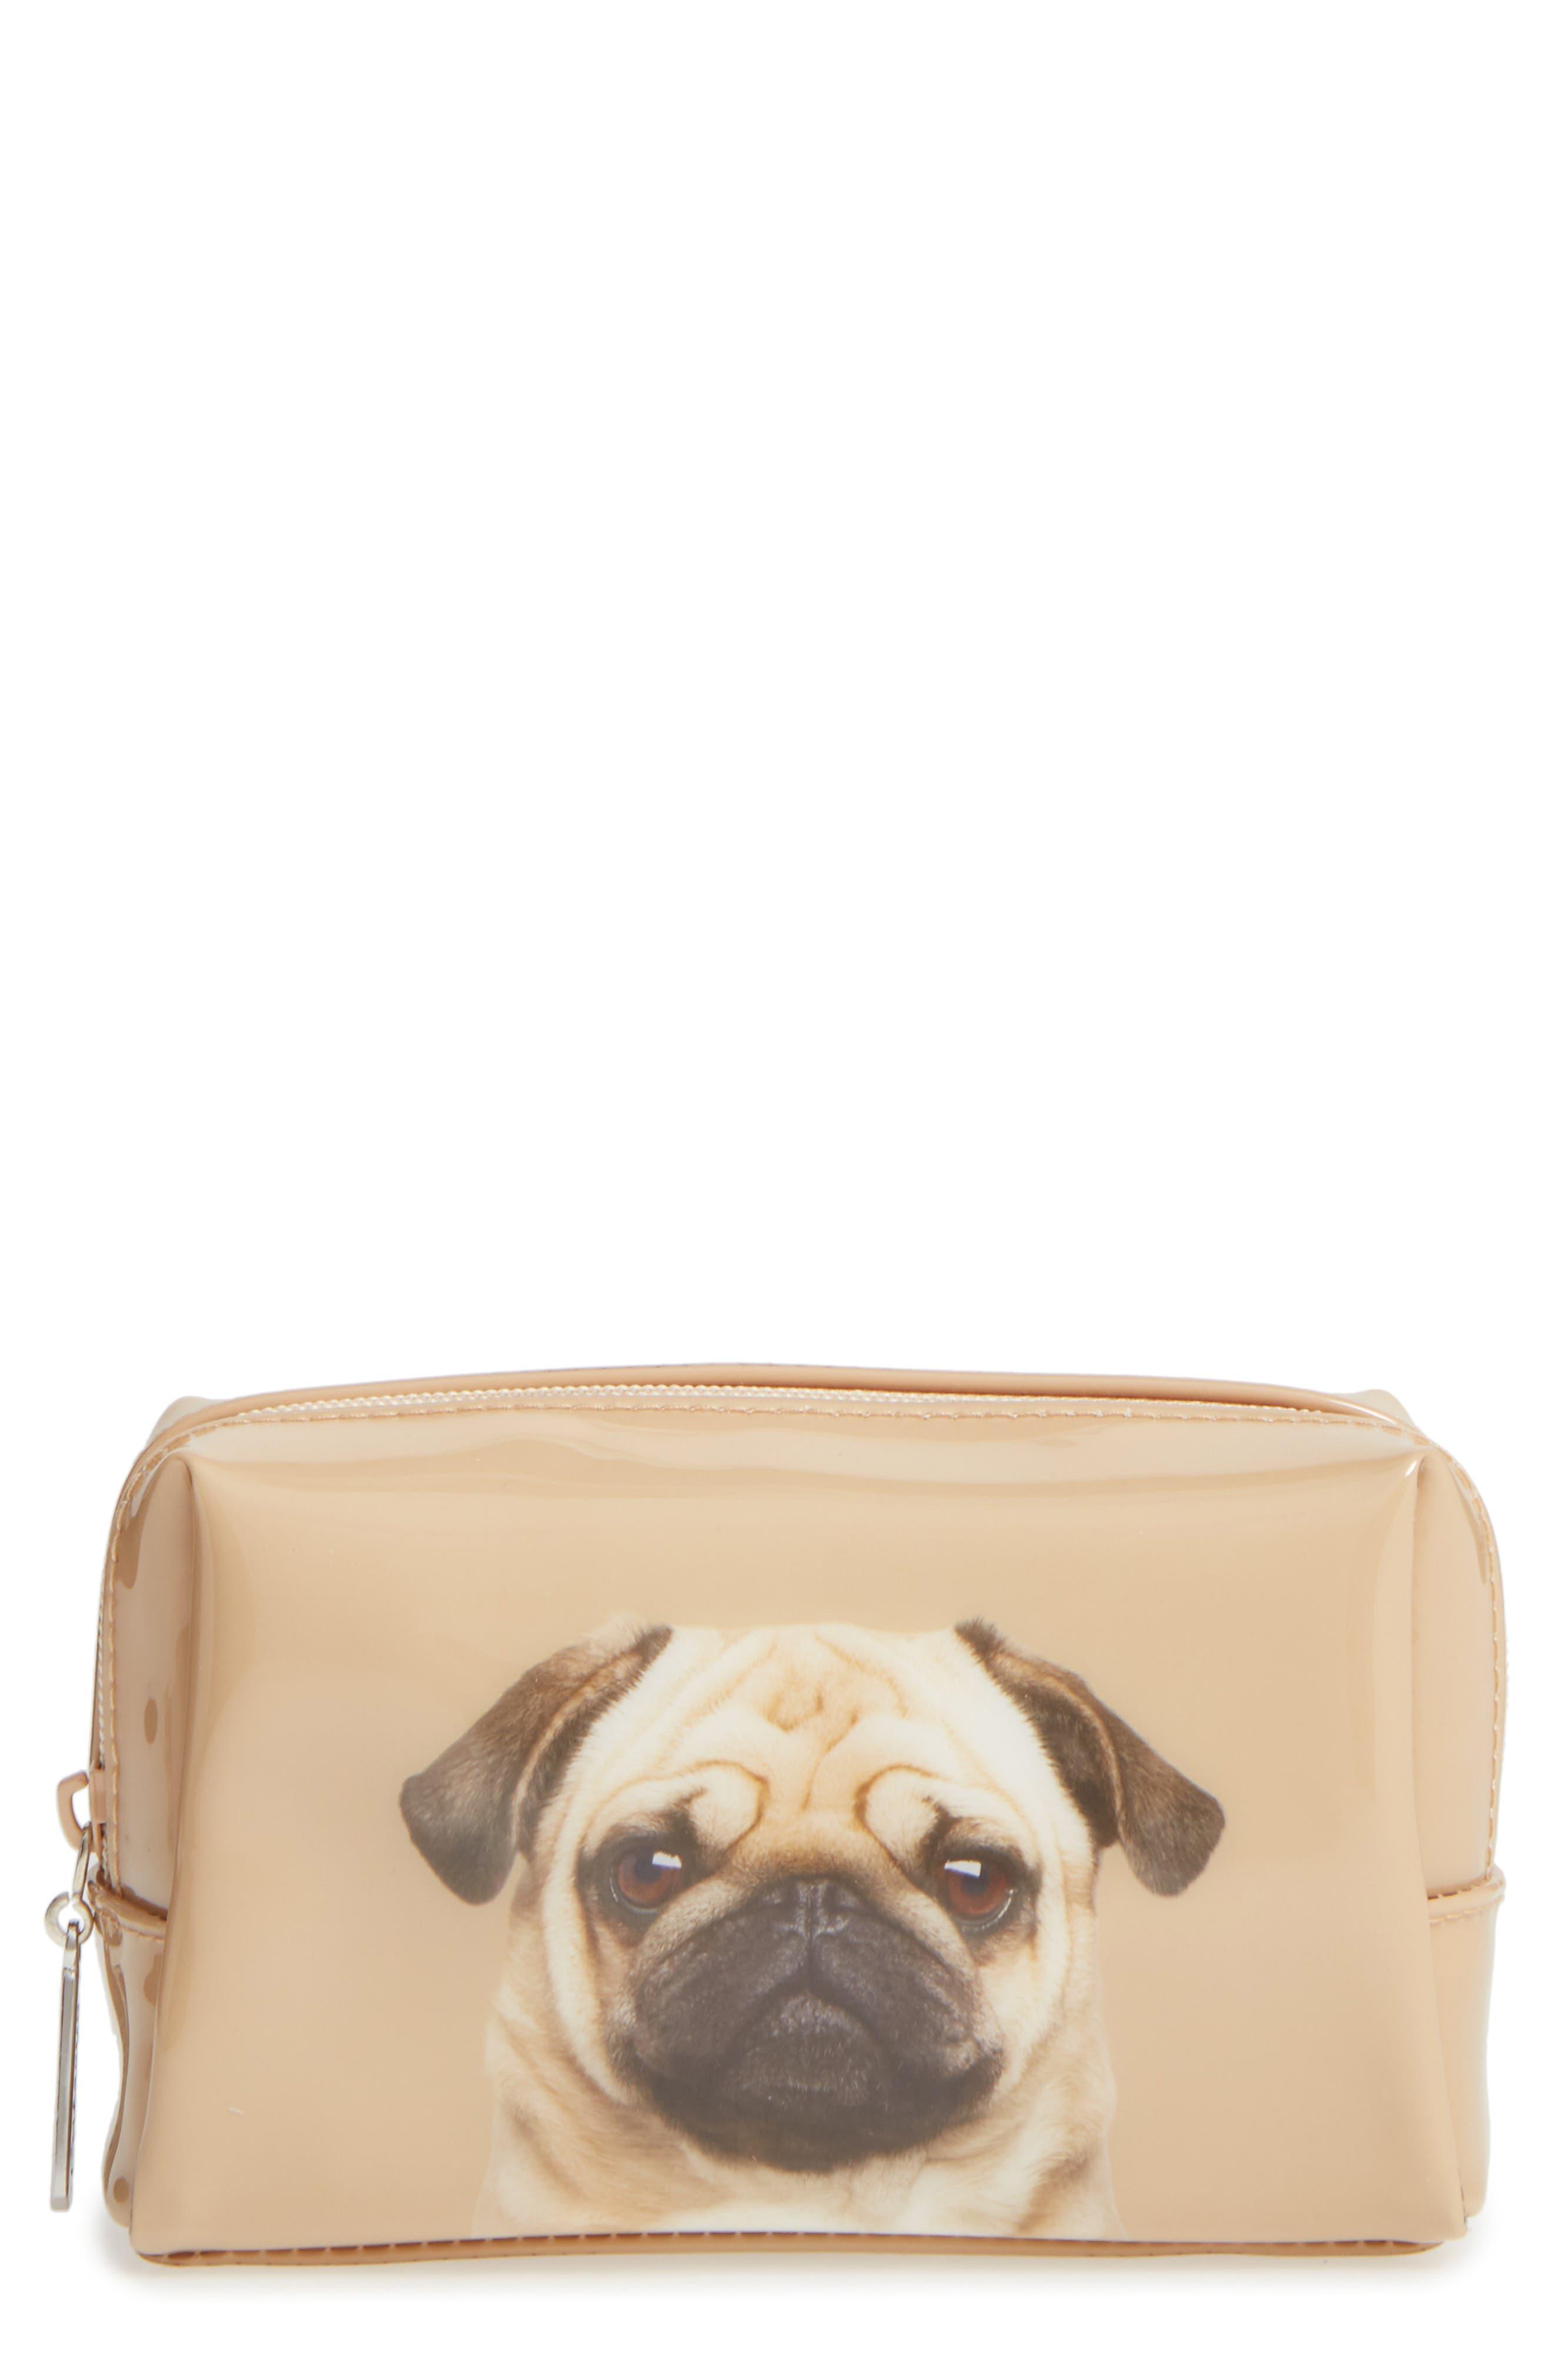 Caramel Pug Cosmetics Case,                         Main,                         color, 250